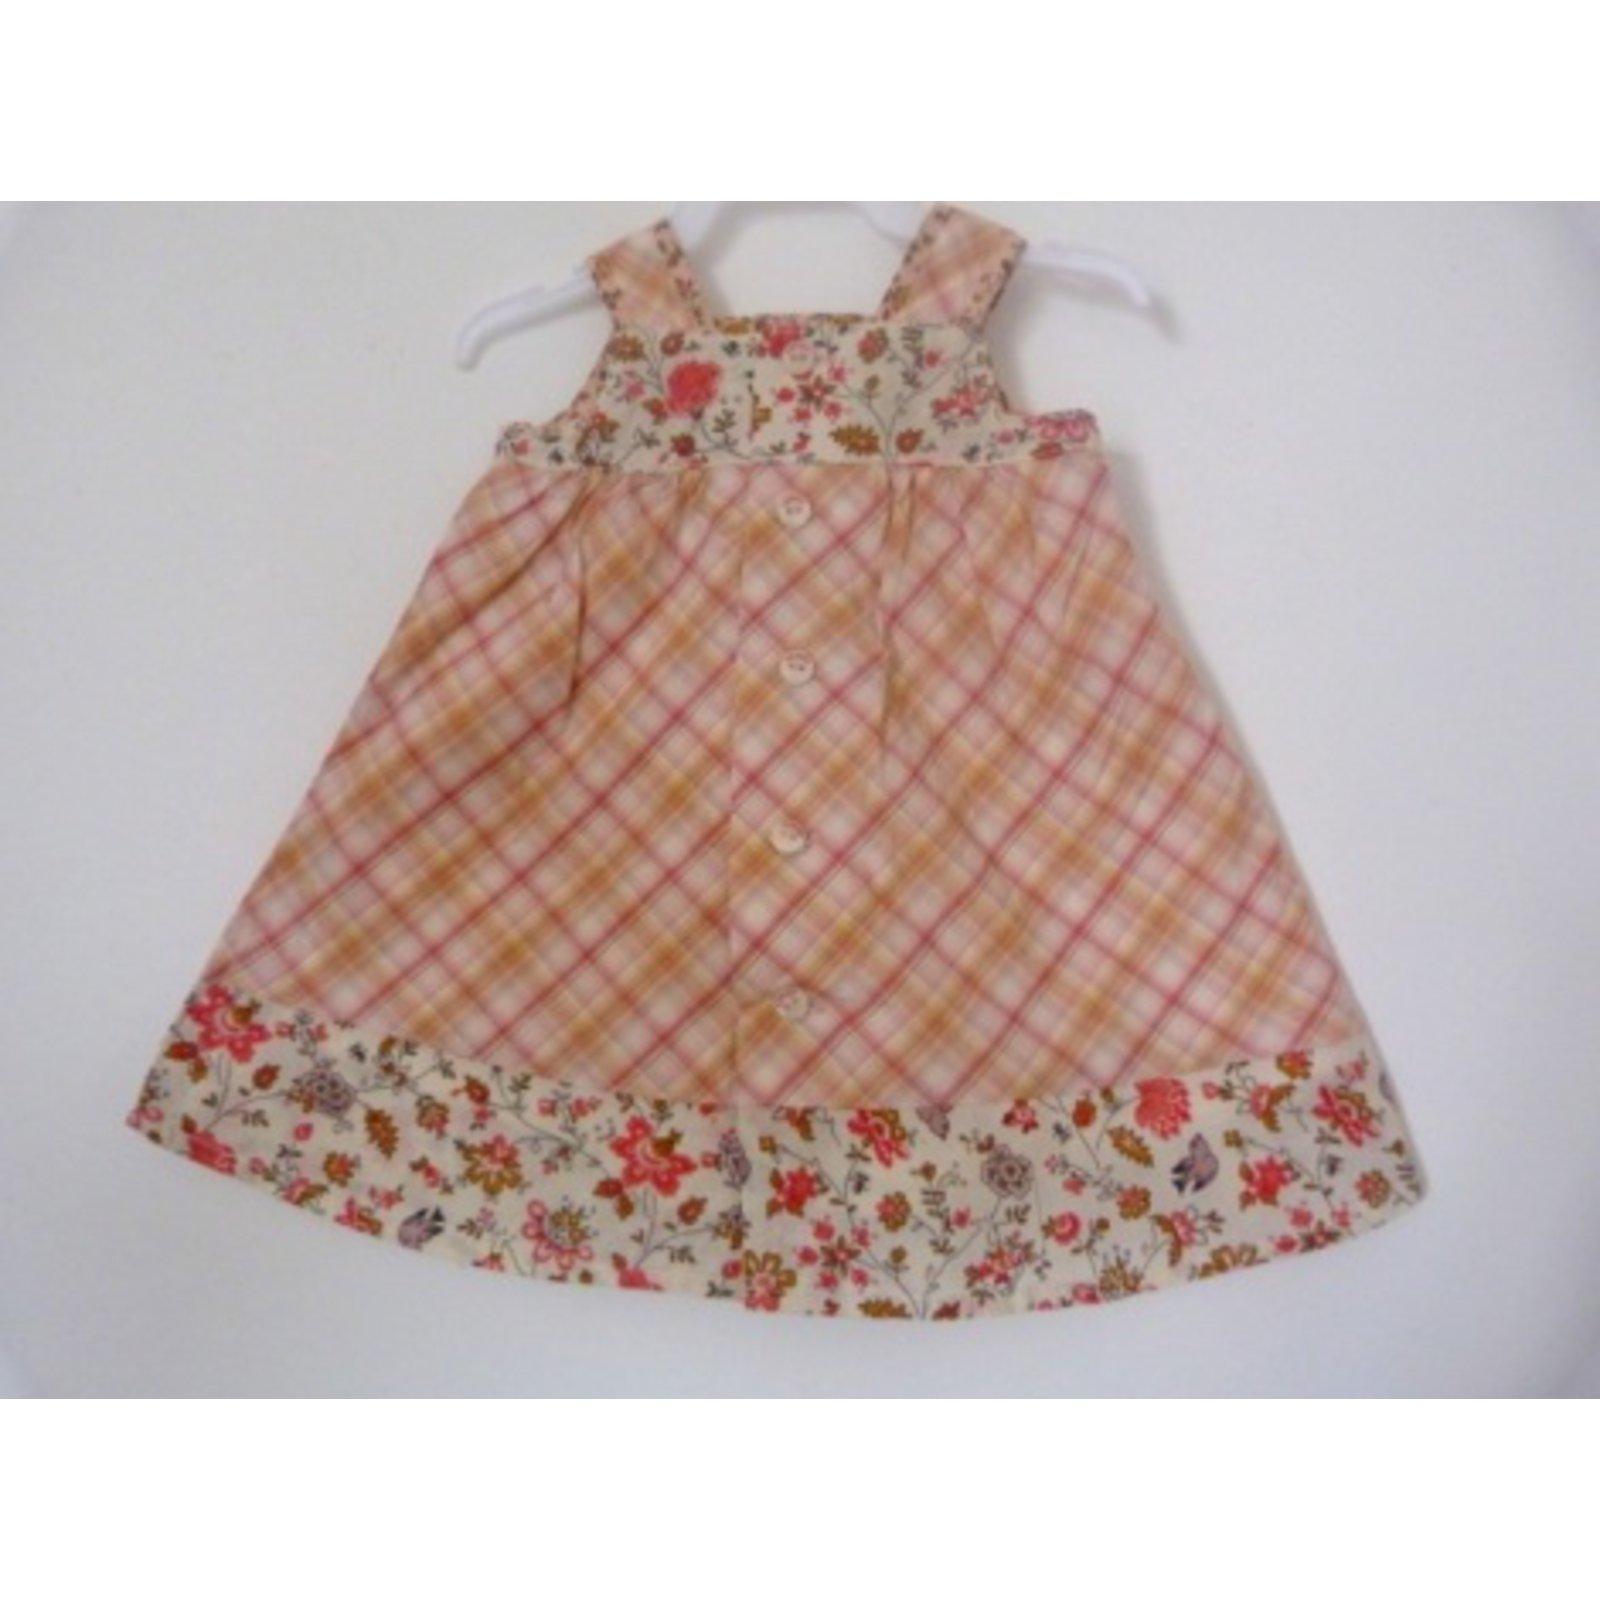 1c717f2385b88 Robes Kenzo Robe bébé Coton Multicolore ref.5596 - Joli Closet